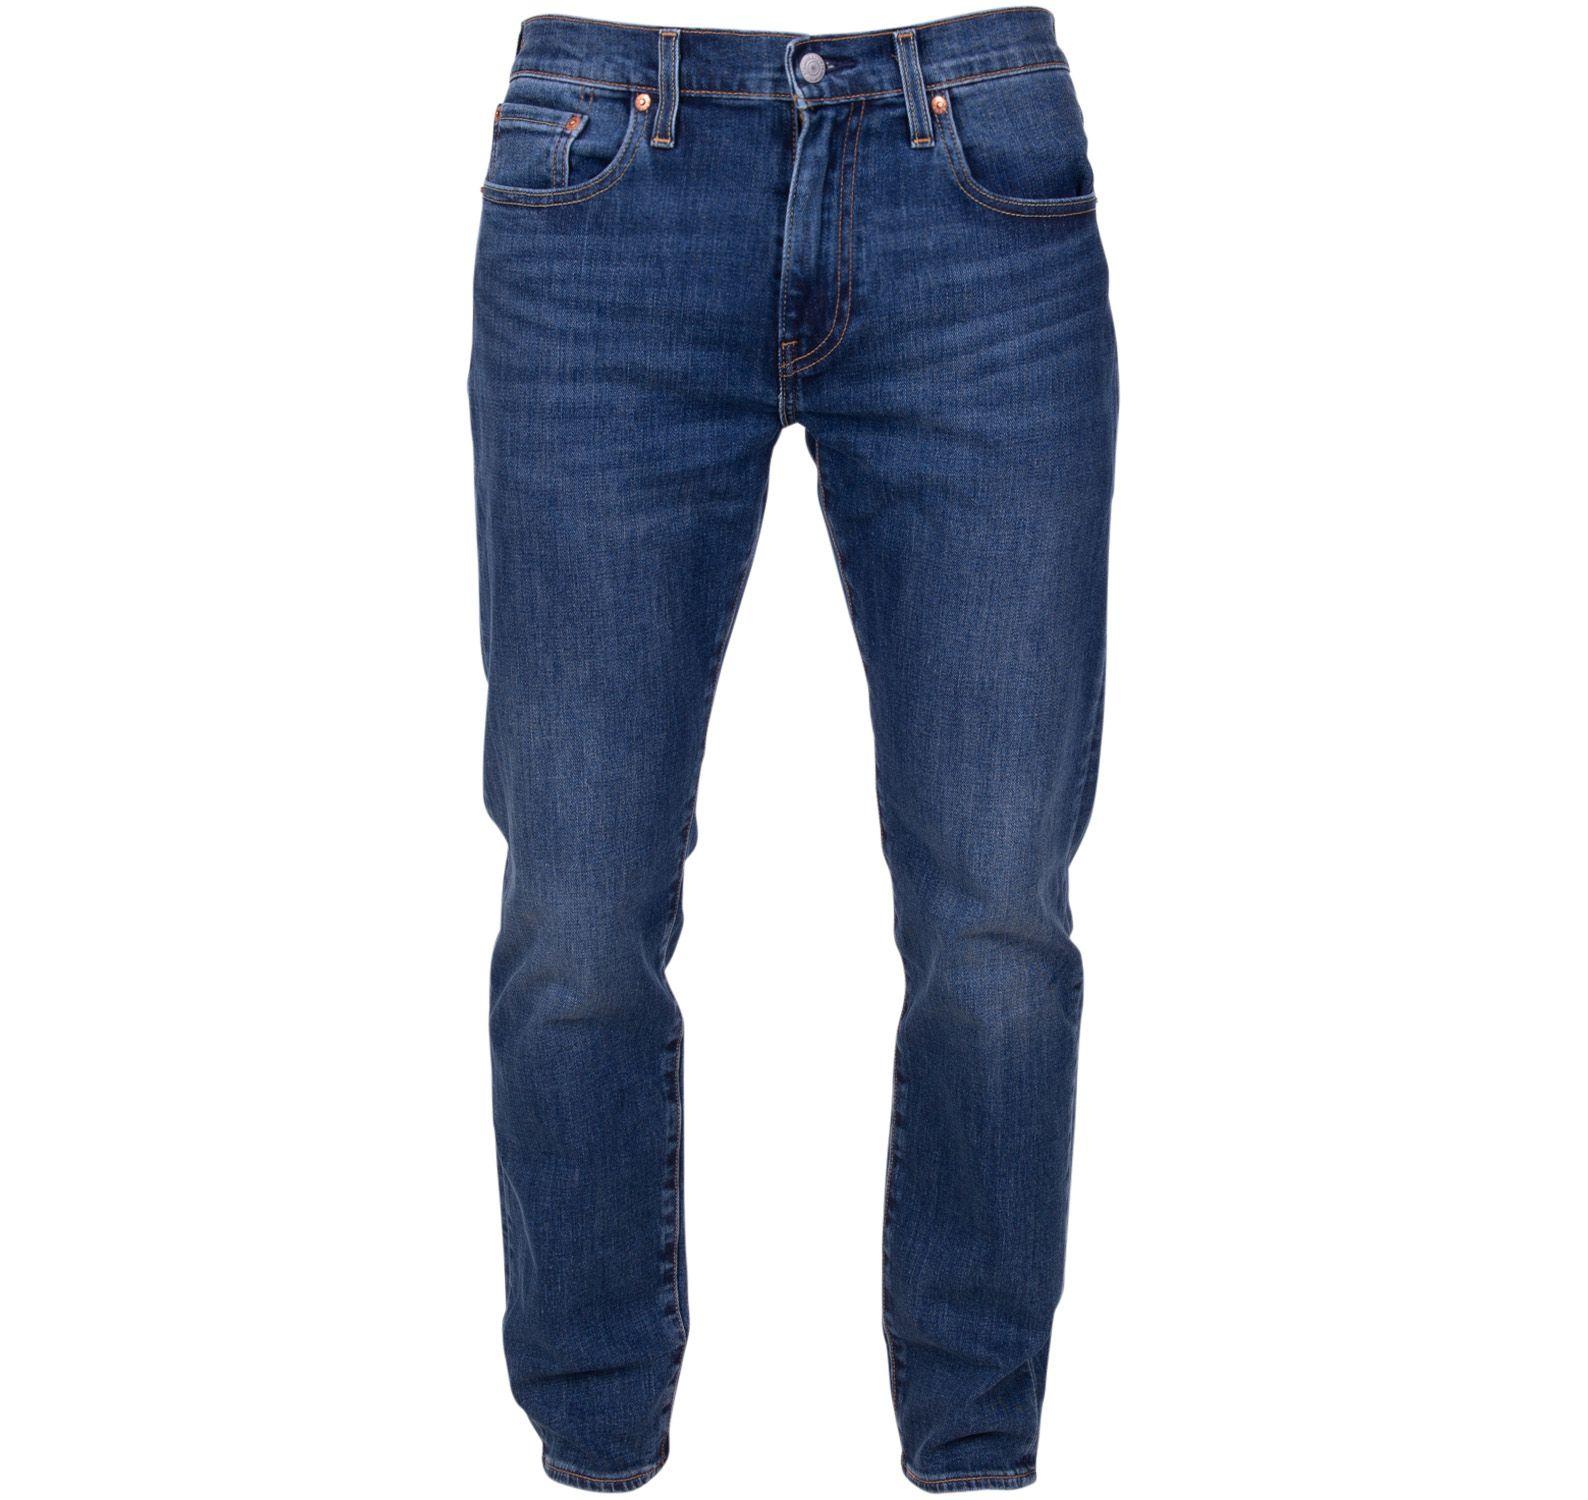 502 Regular Taper Crocodile Ad, Med Indigo - Worn In, 31/32,  Levi's Jeans